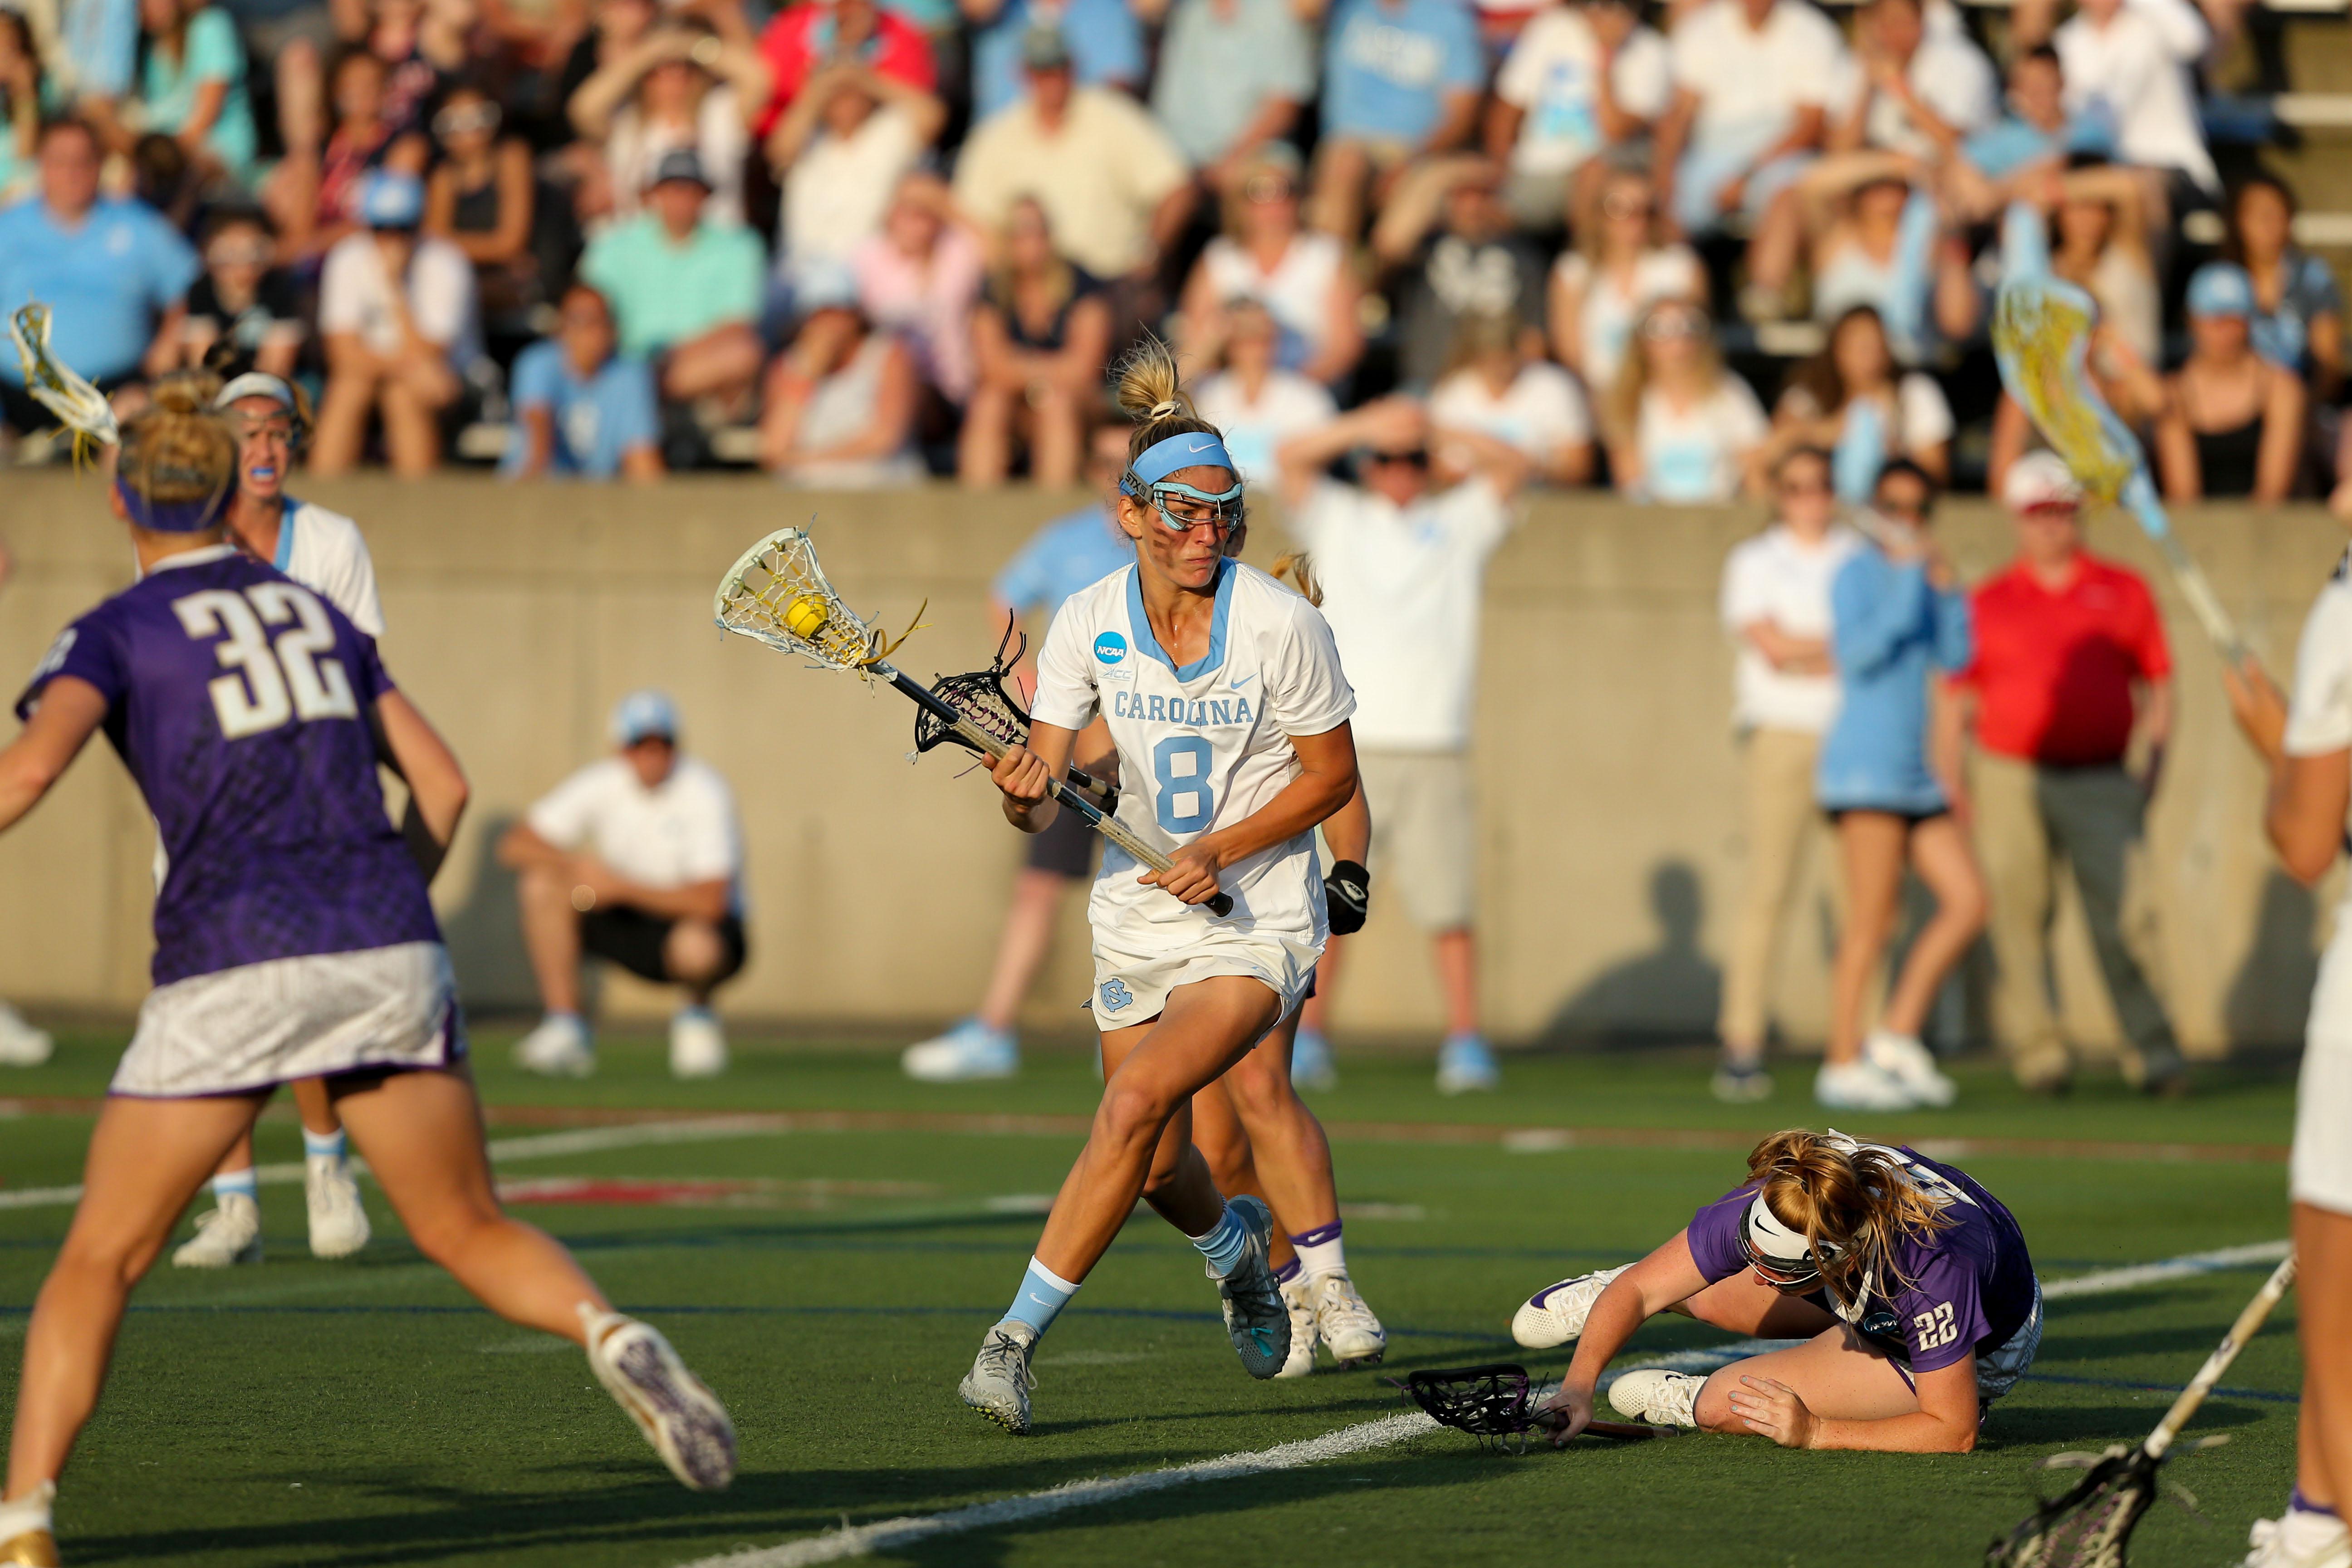 NCAA Lacrosse: Women's Lacrosse Championship-James Madison vs North Carolina